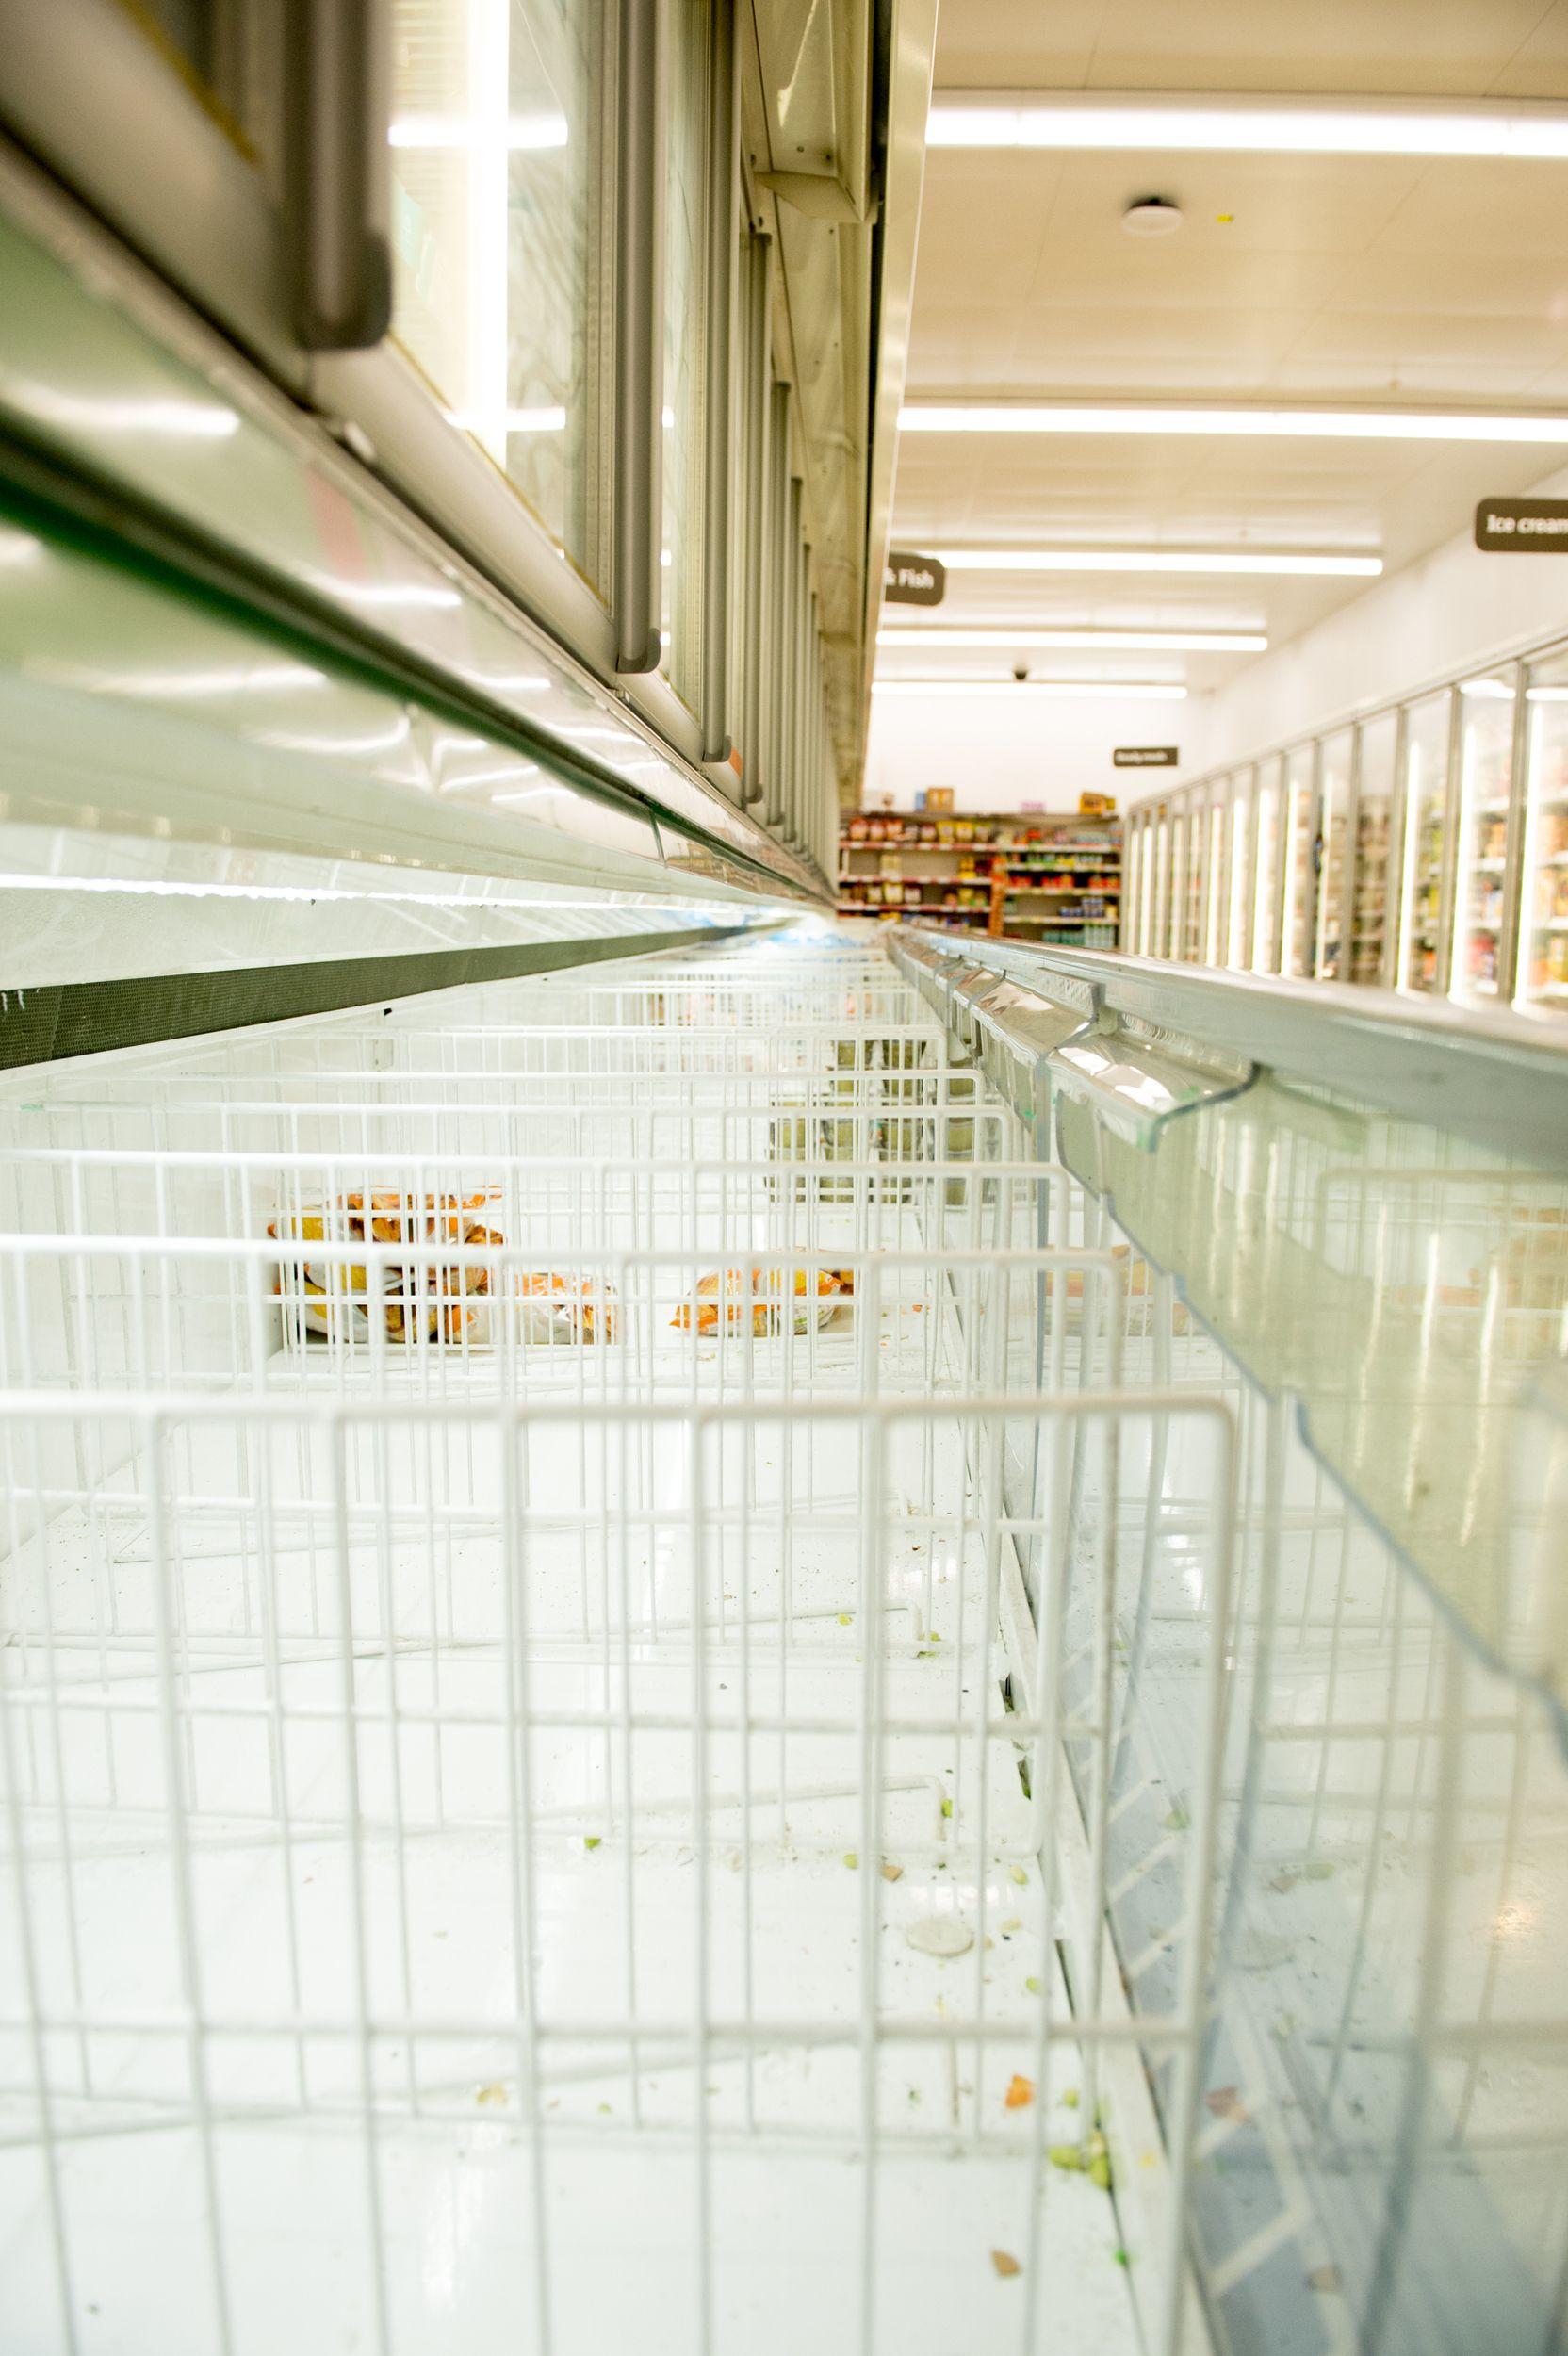 LONDON, ENGLAND MARCH 14 Empty Supermarket frozen